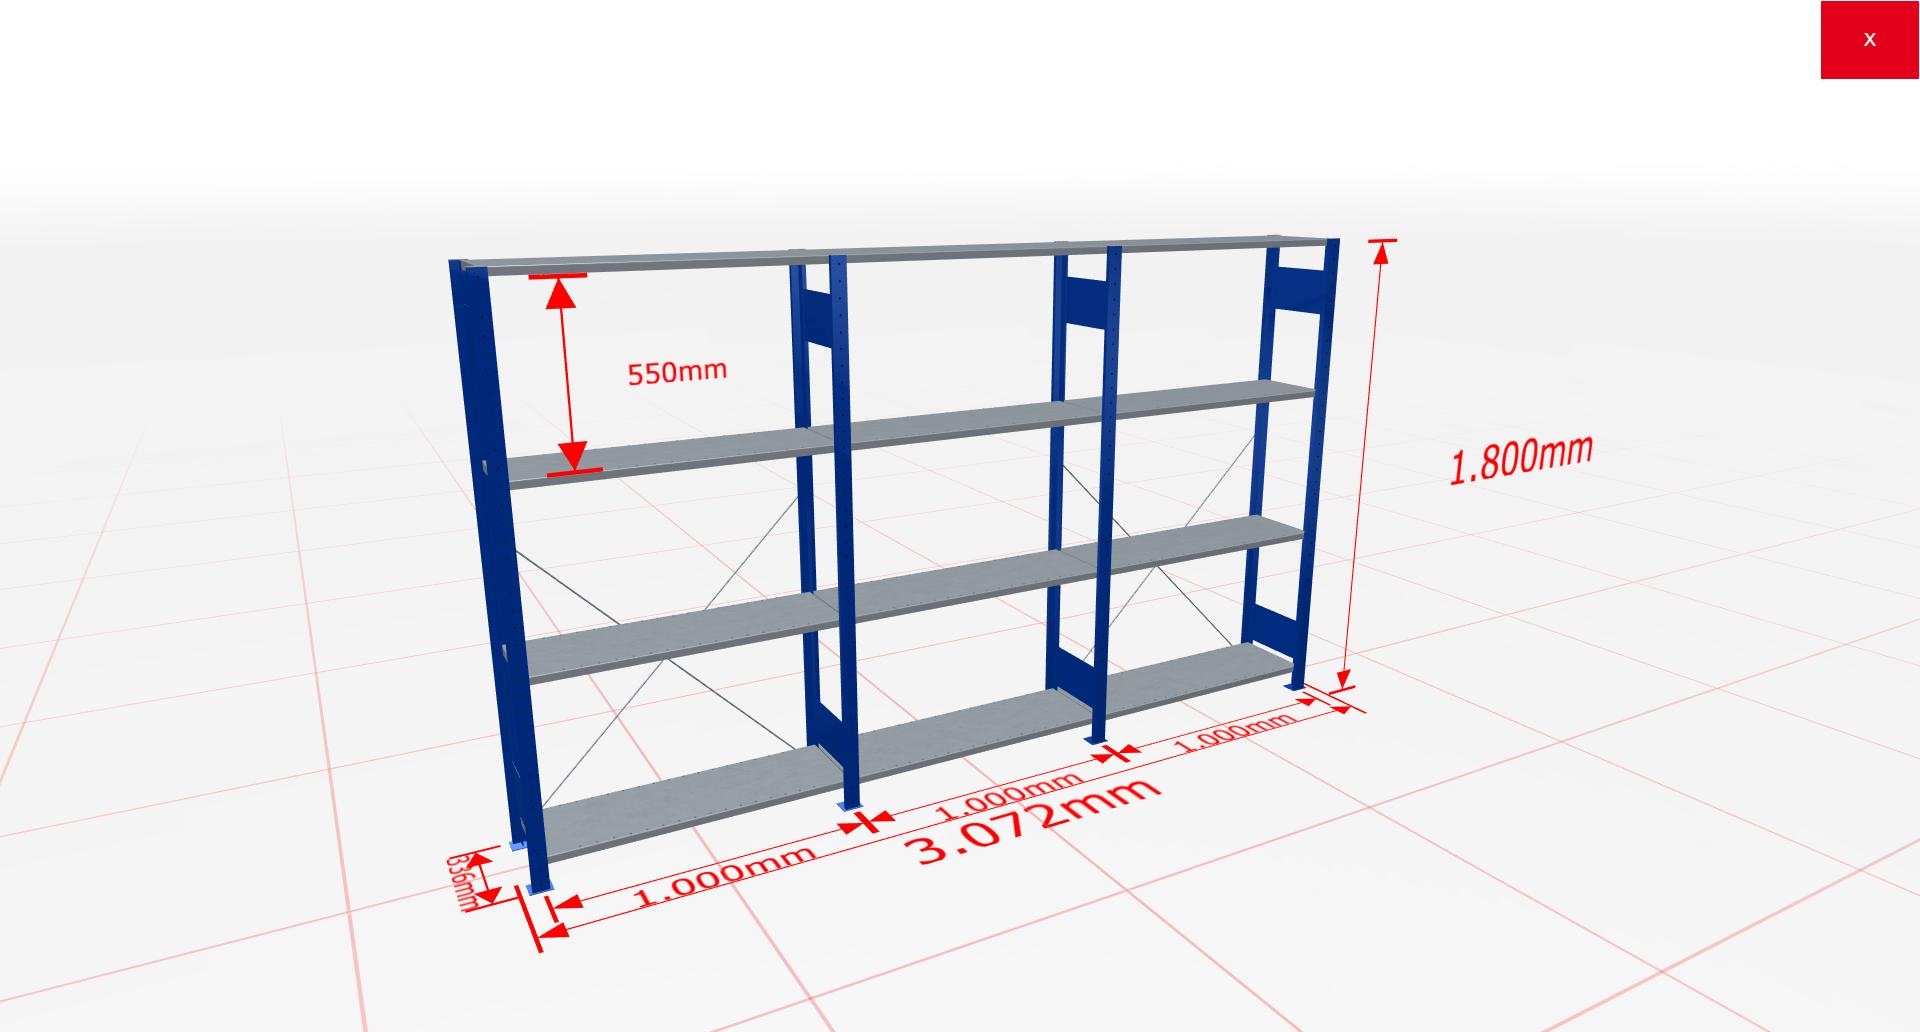 Fachbodenregal Komplettregal 1800x3072x300 mm (HxBxT) SCHULTE Lagertechnik blau 4 Ebenen  150 kg je Boden